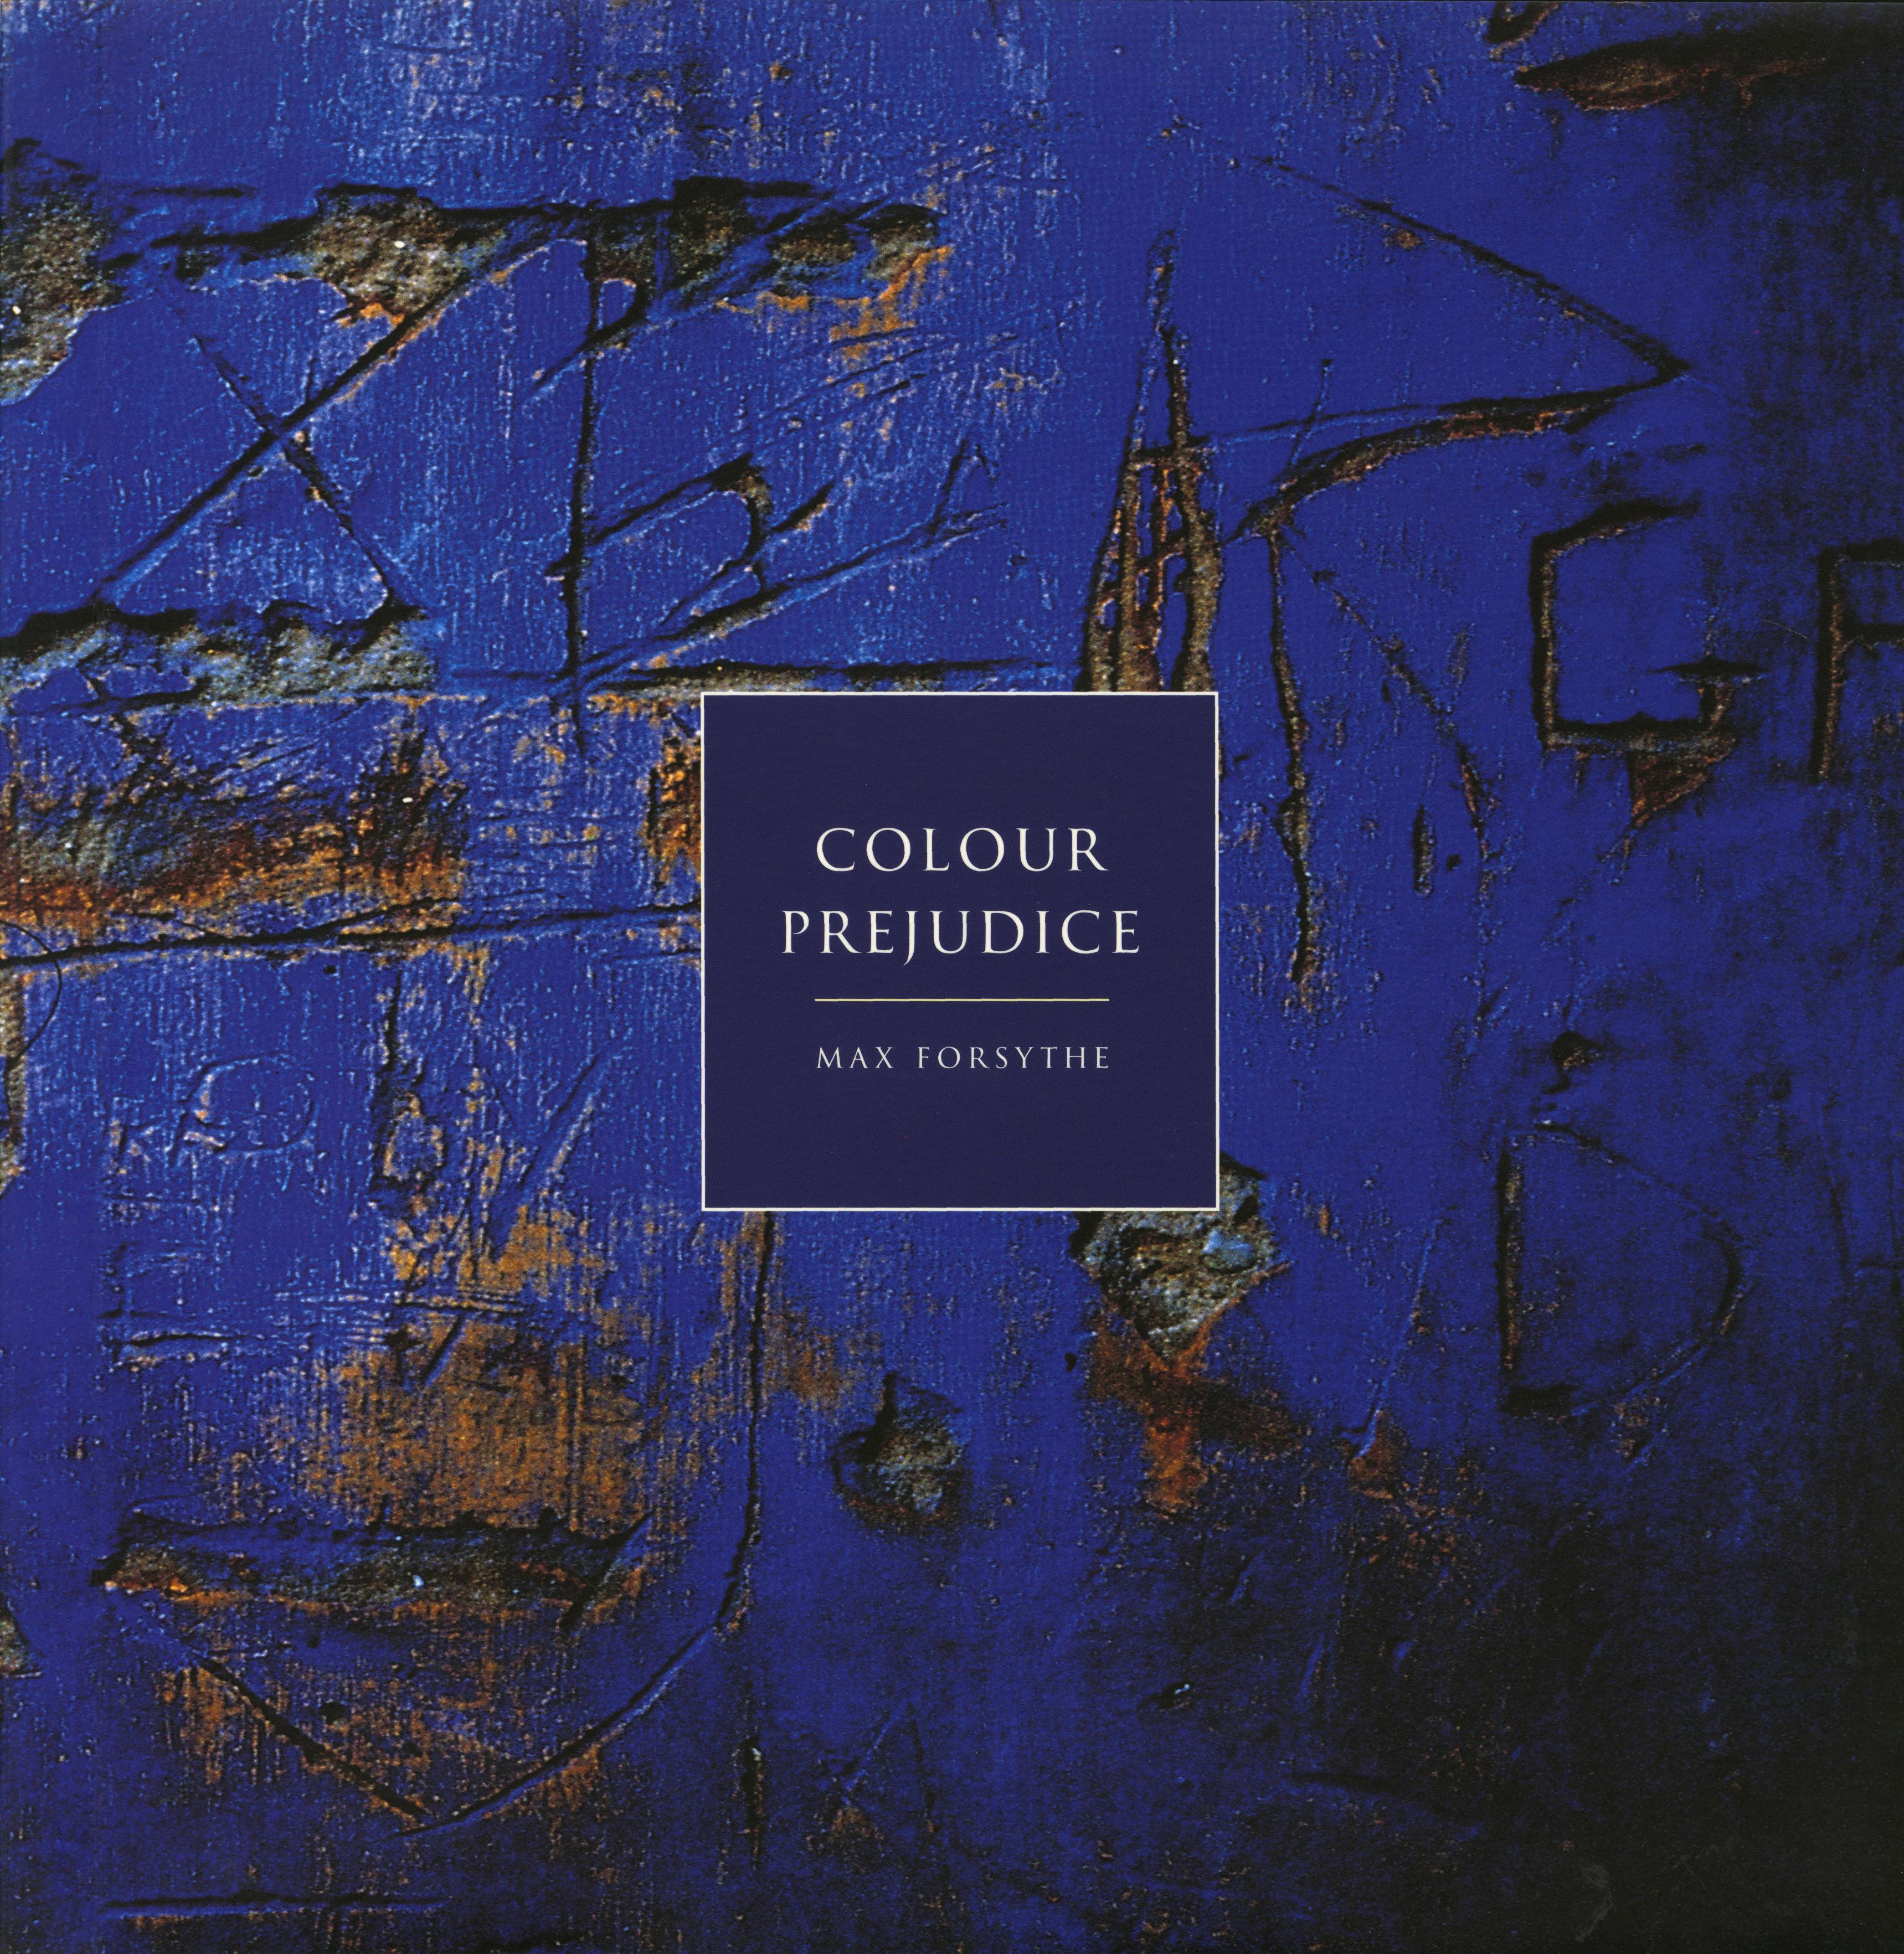 Max Forsythe, Cover of 'Colour Prejudice' book-01